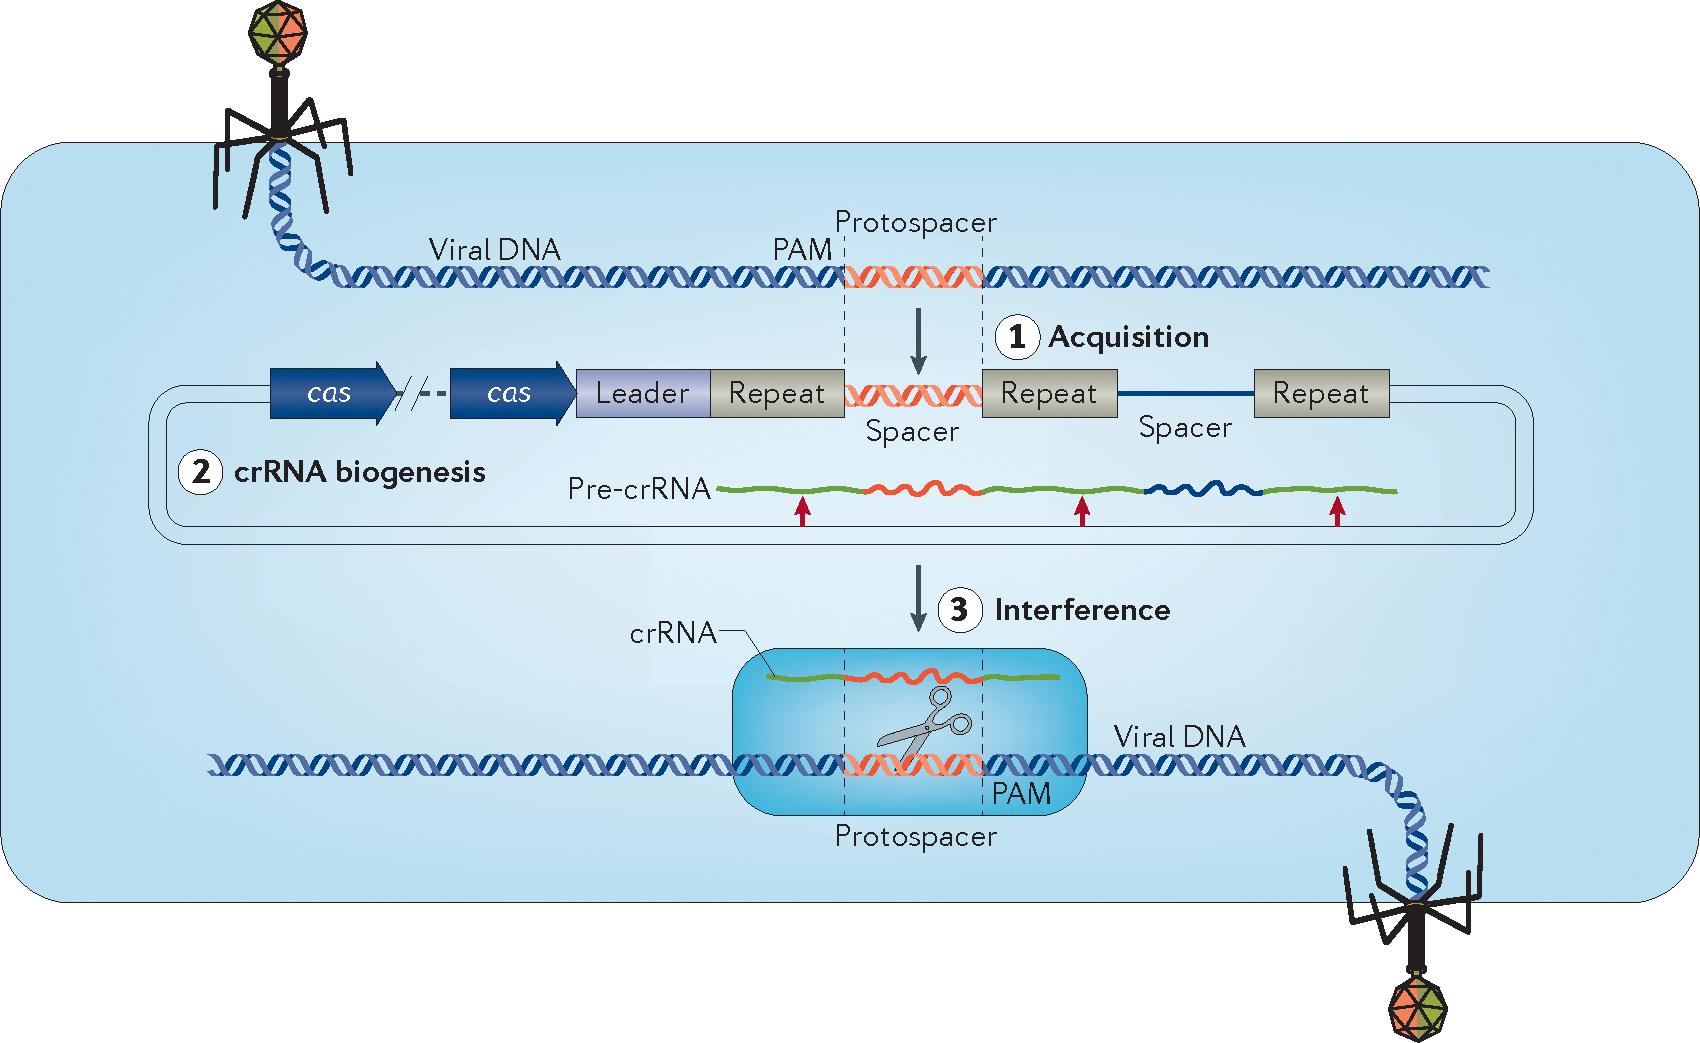 [Gibson GJ, Yang M. What Rheumatologists Need To Know About CRISPR/Cas9. Nat Rev Rheumatol. 2017 Apr;13(4):205-216]